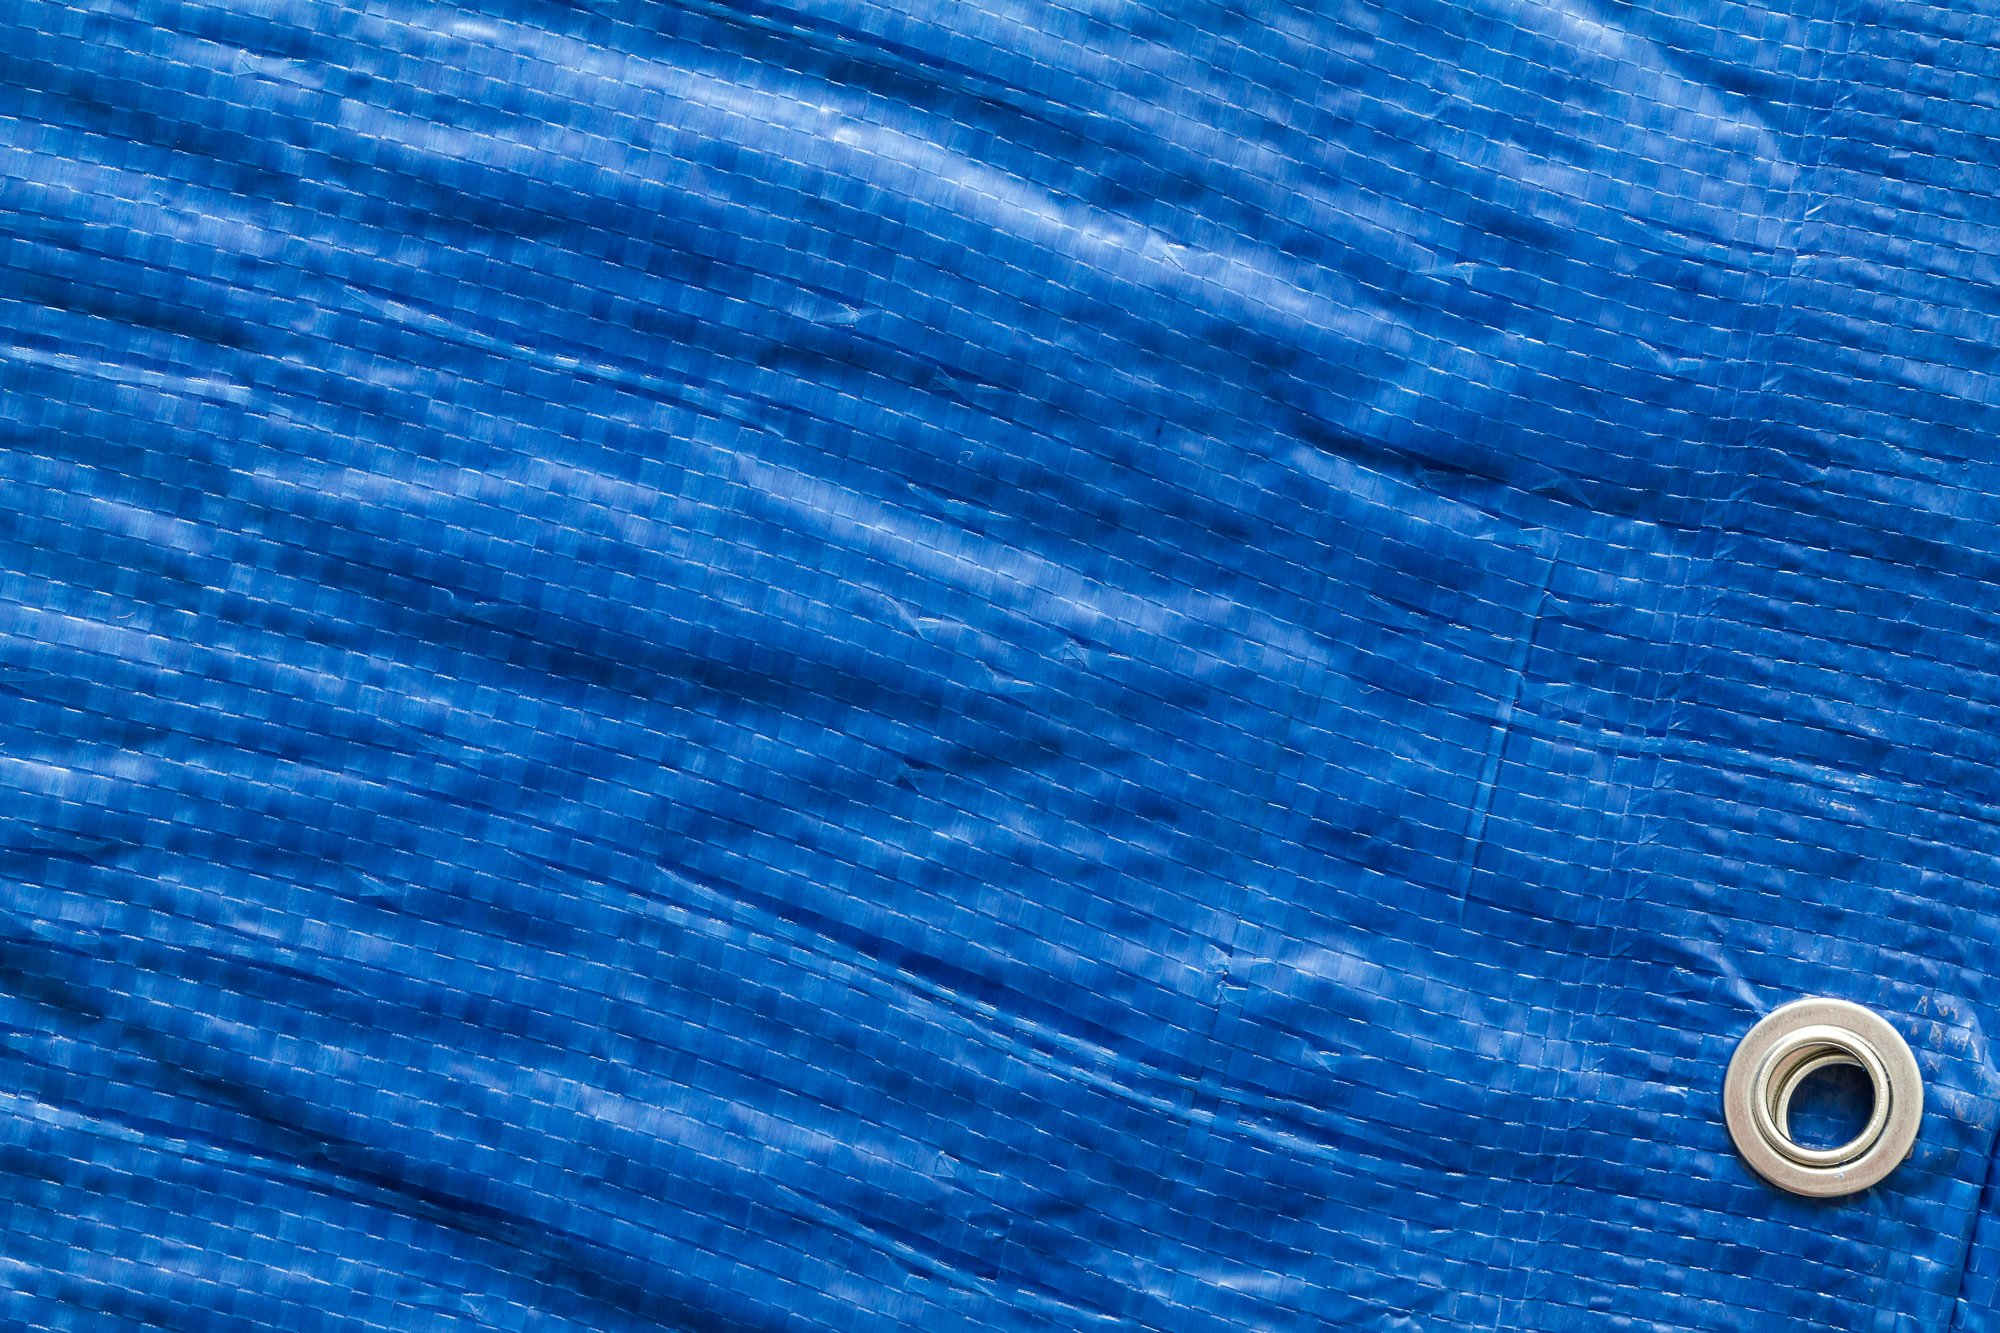 Waterproof Tarpaulin Lightweight Ground Sheet Camping Tarp Cover Blue 5m x 8m